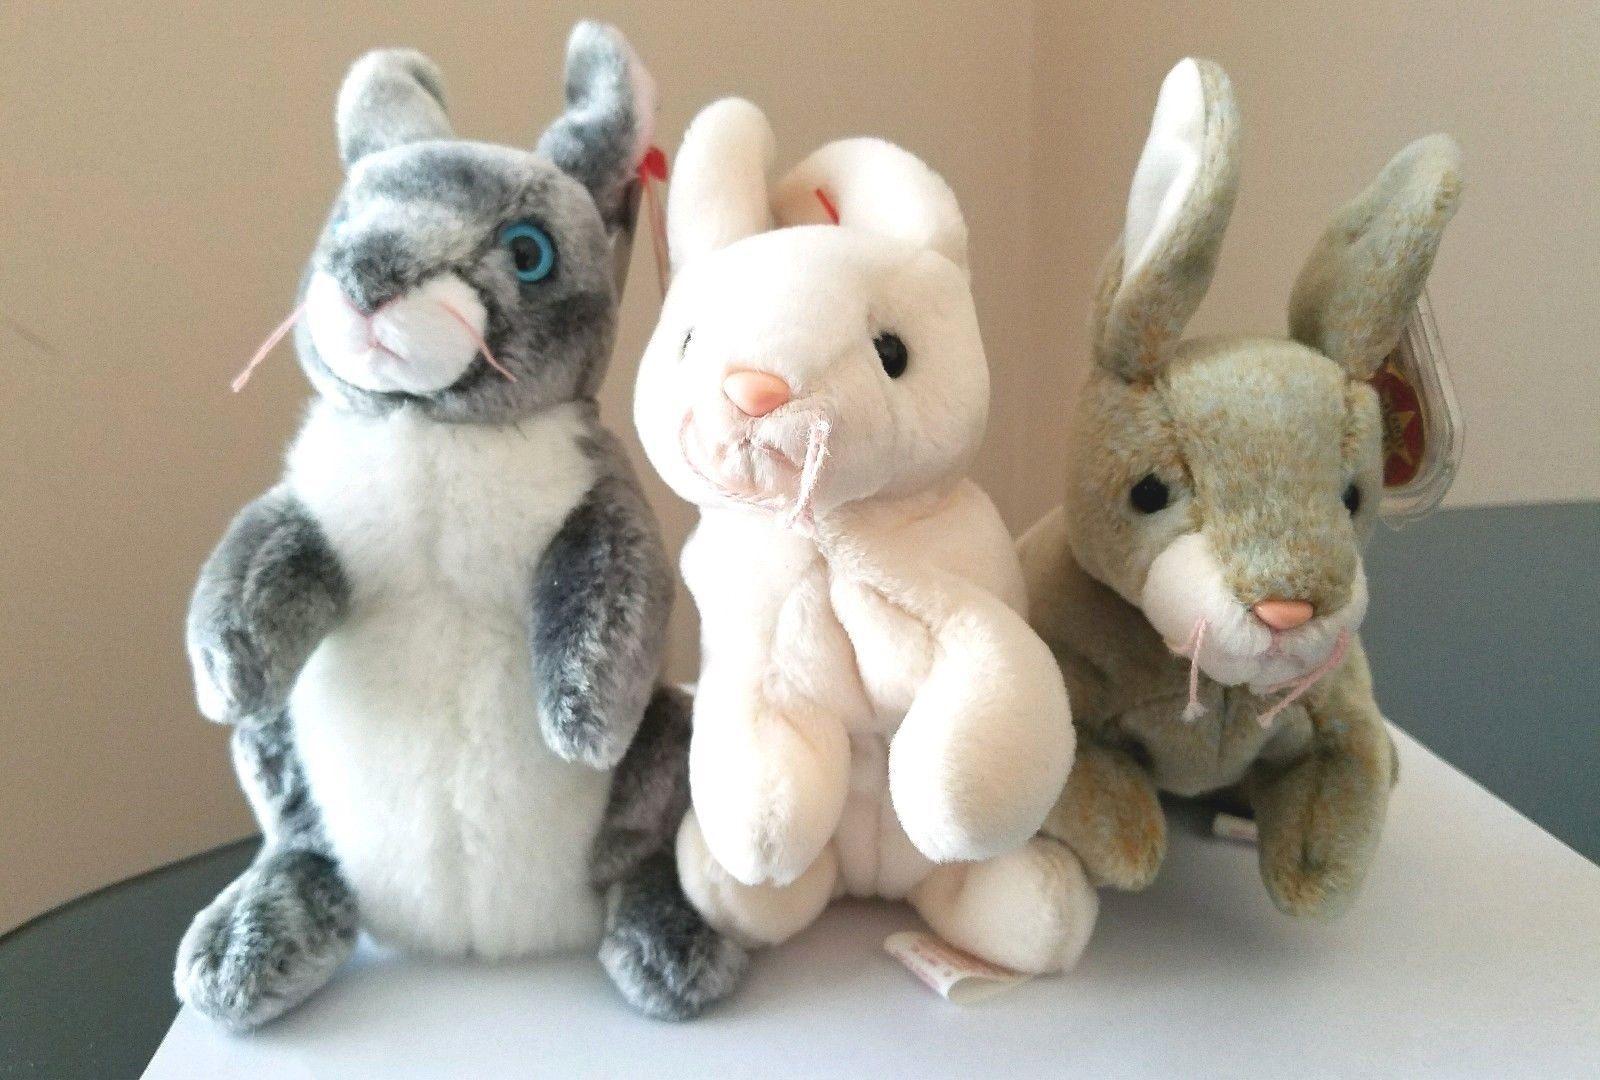 Easter Ty Beanie Baby Hopper MWMT Bunny 2000